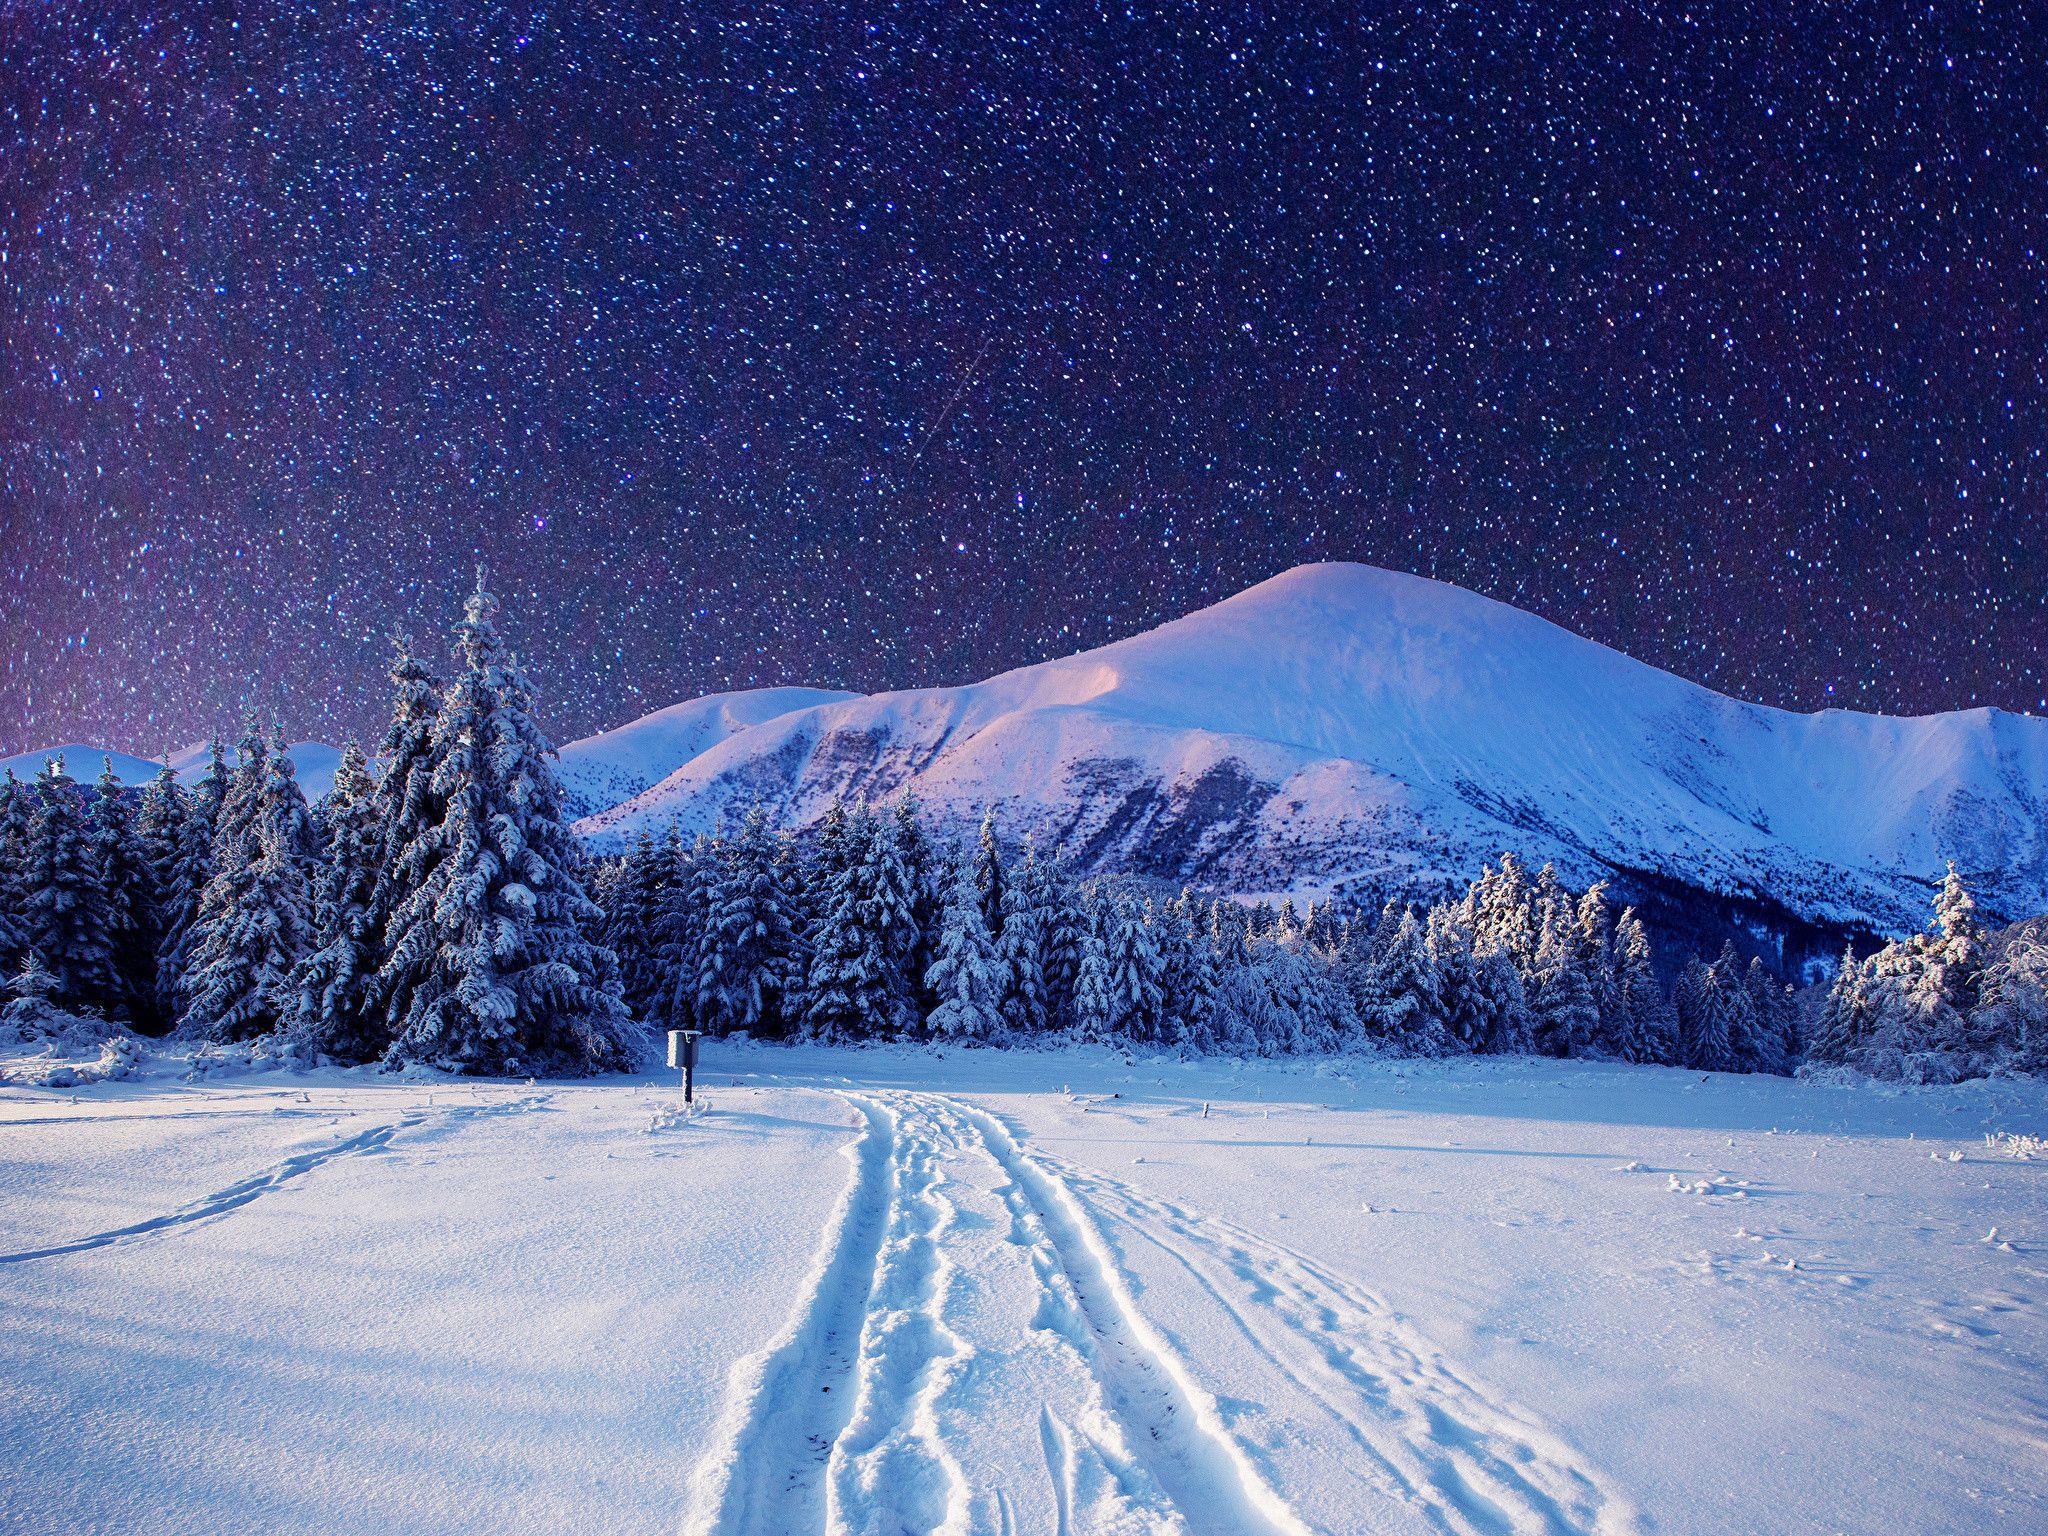 Cold Winter Night Sky Full With Stars Wonderful Landscape Beautiful Nature Landscapes Deskt Winter Wallpaper Desktop Night Sky Wallpaper Landscape Wallpaper